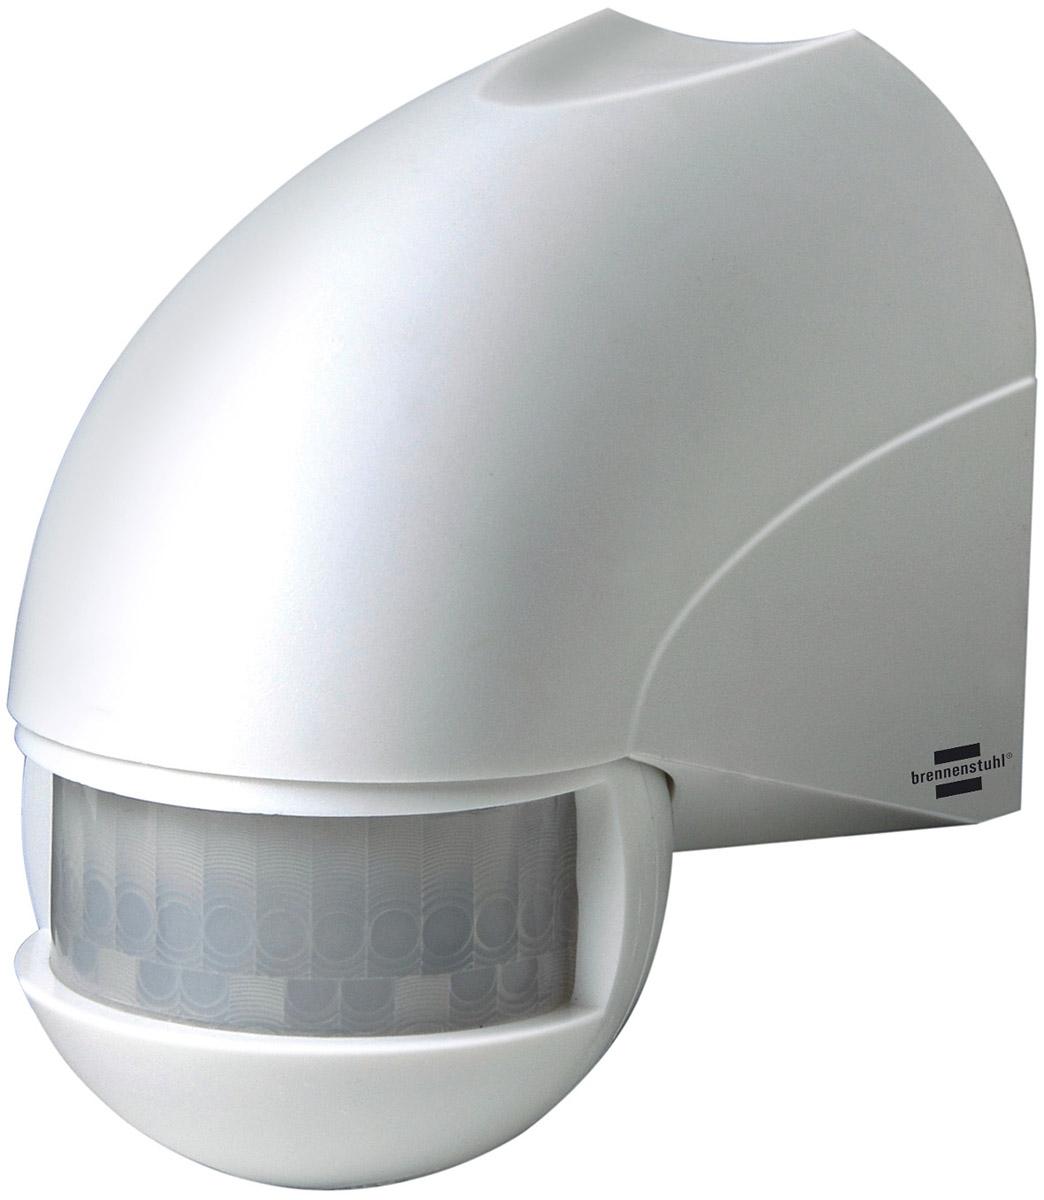 Brennenstuhl Bewegungsmelder Infrarot-Bewegungsmelder PIR 180 IP44 Weiß, 1170900